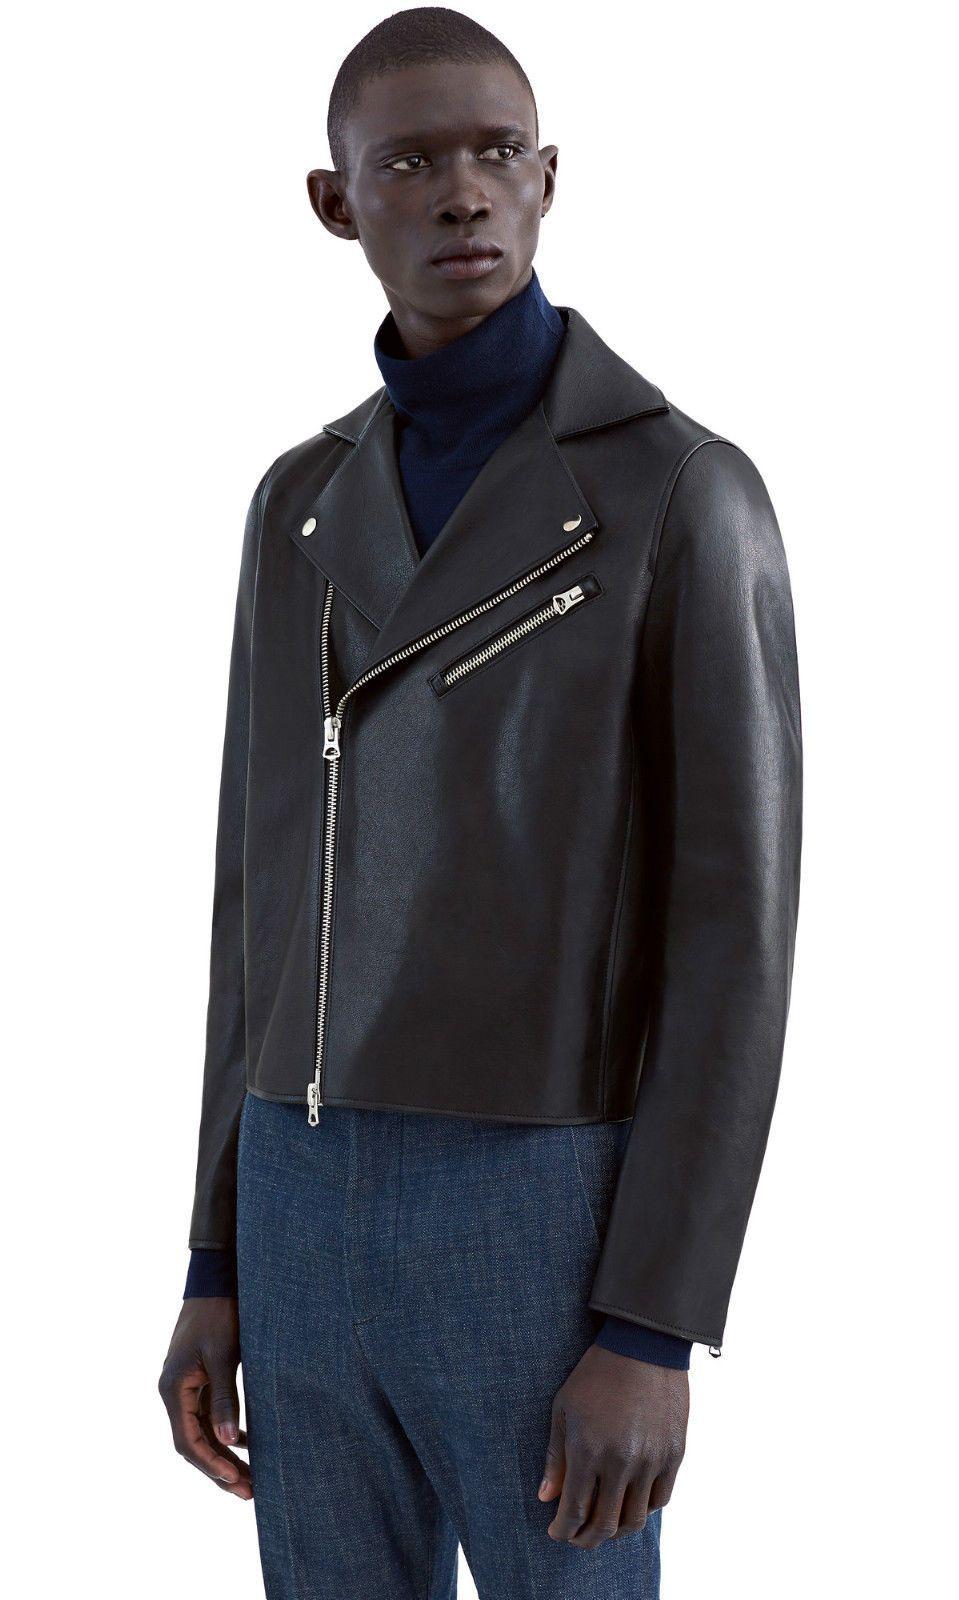 Acne Studios Gibson Black Leather Jacket Sz50 New w tags   Care bag Free  P P   eBay b65db39df9c